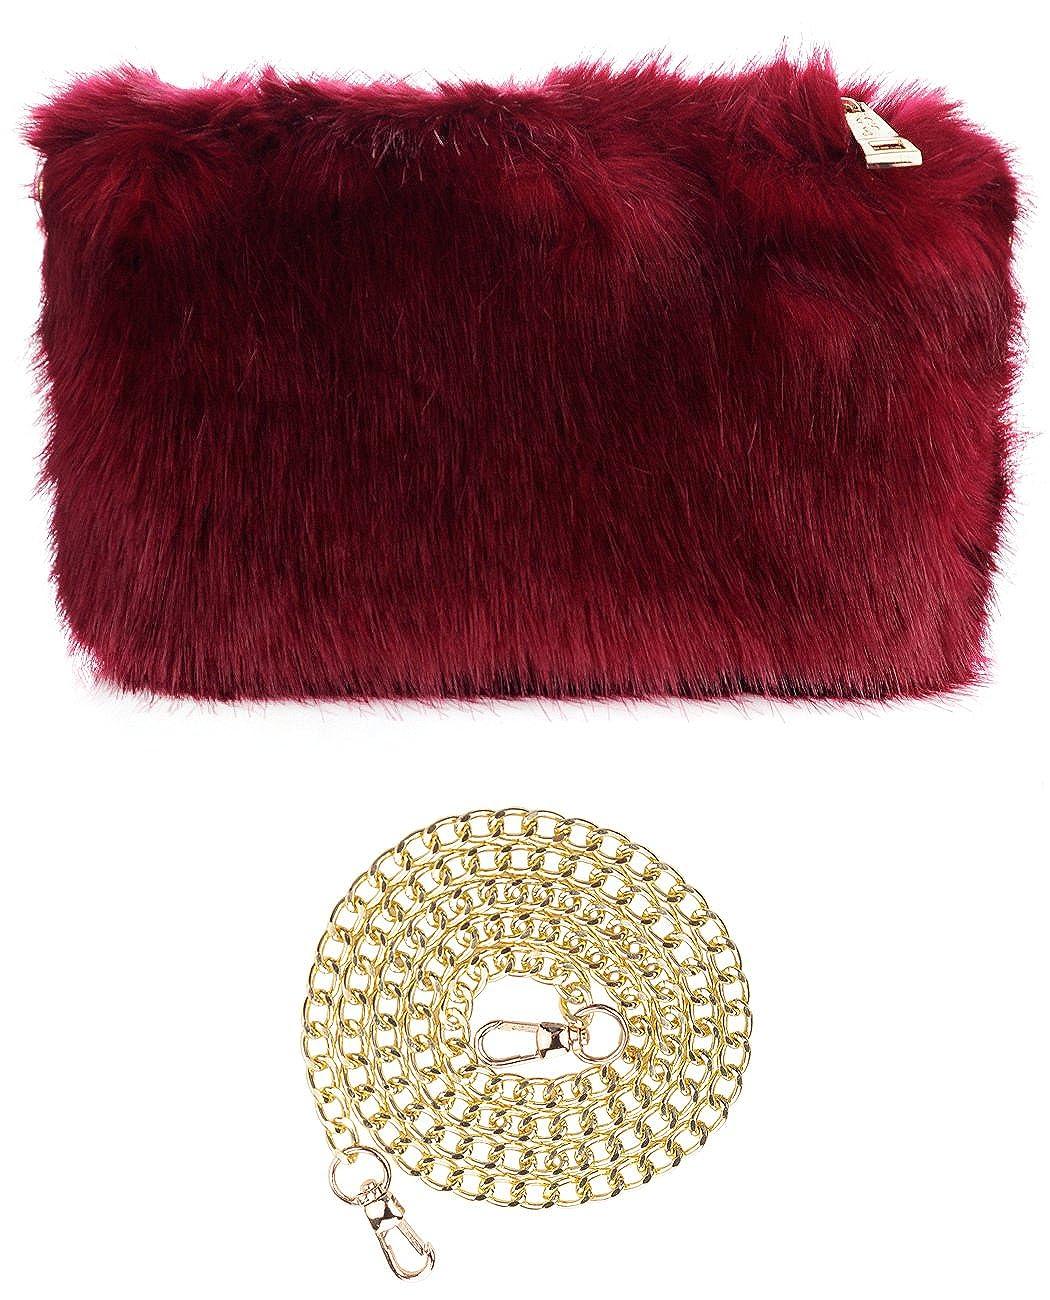 3e849462a95 CC Women's Evening Faux Fur Fuzzy Crossbody Shoulder Bag Clutch Purse